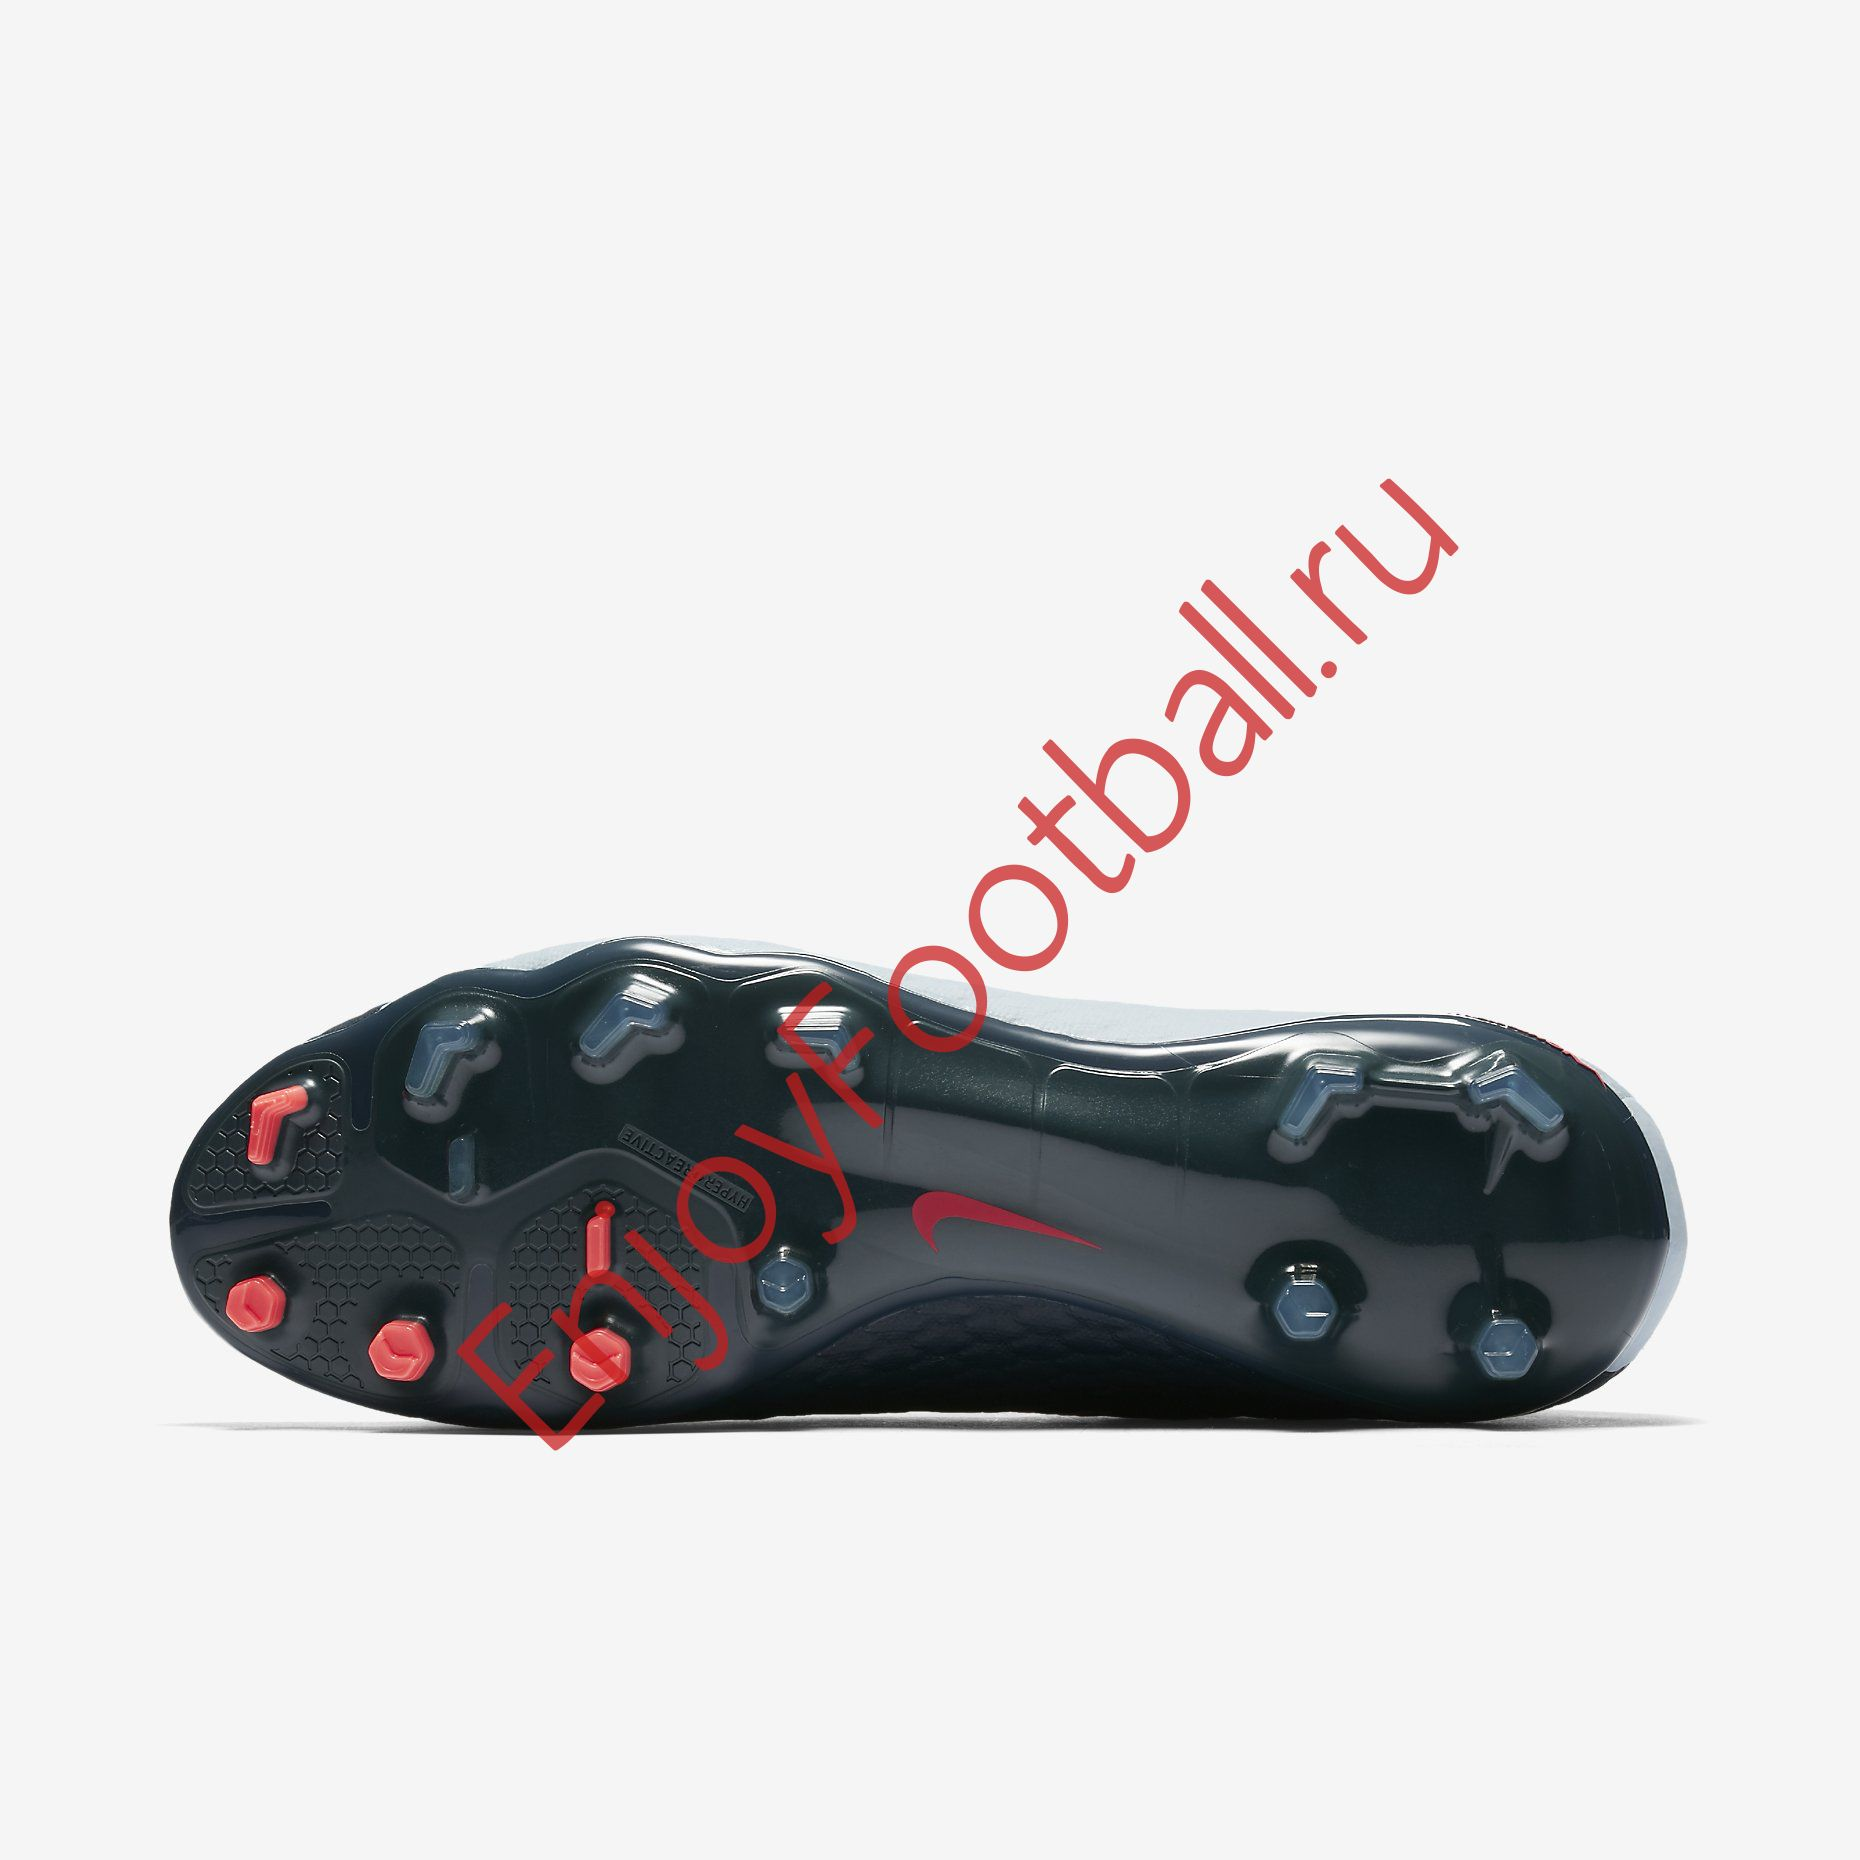 61fe61a5aced Бутсы NIKE HYPERVENOM PHATAL III DF FG 852554-400 купить в интернет ...